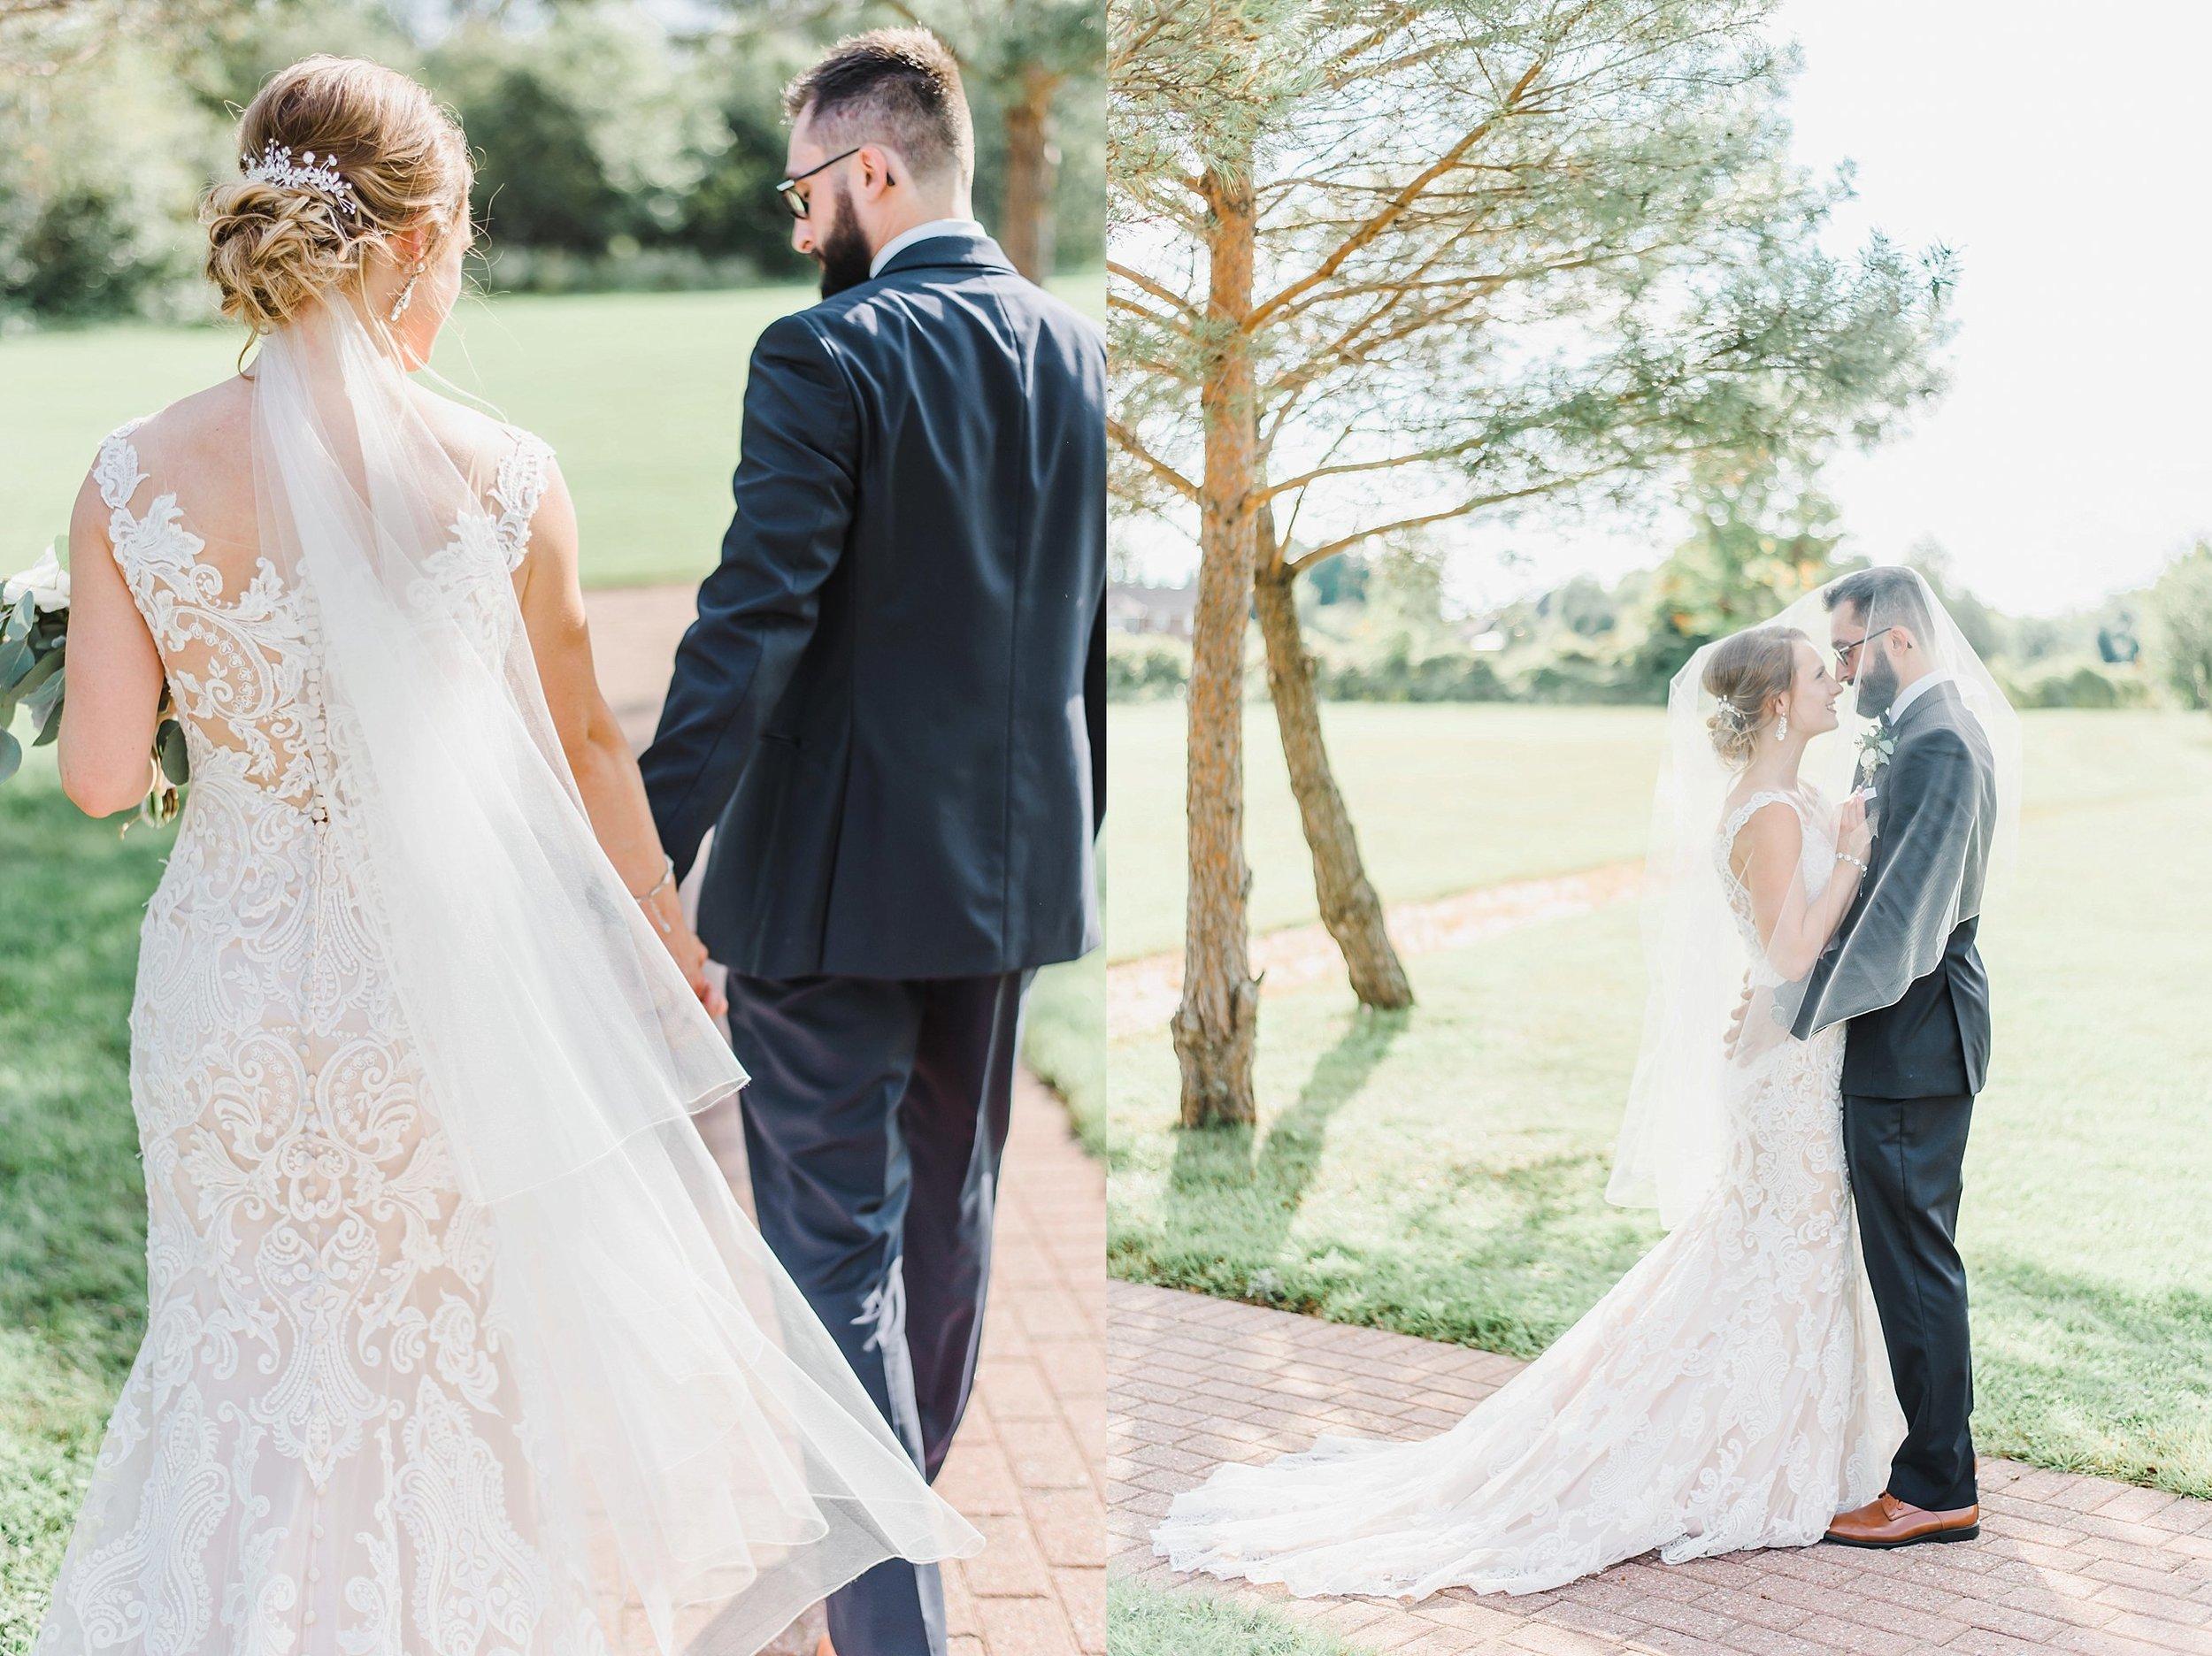 light airy indie fine art ottawa wedding photographer | Ali and Batoul Photography_1310.jpg